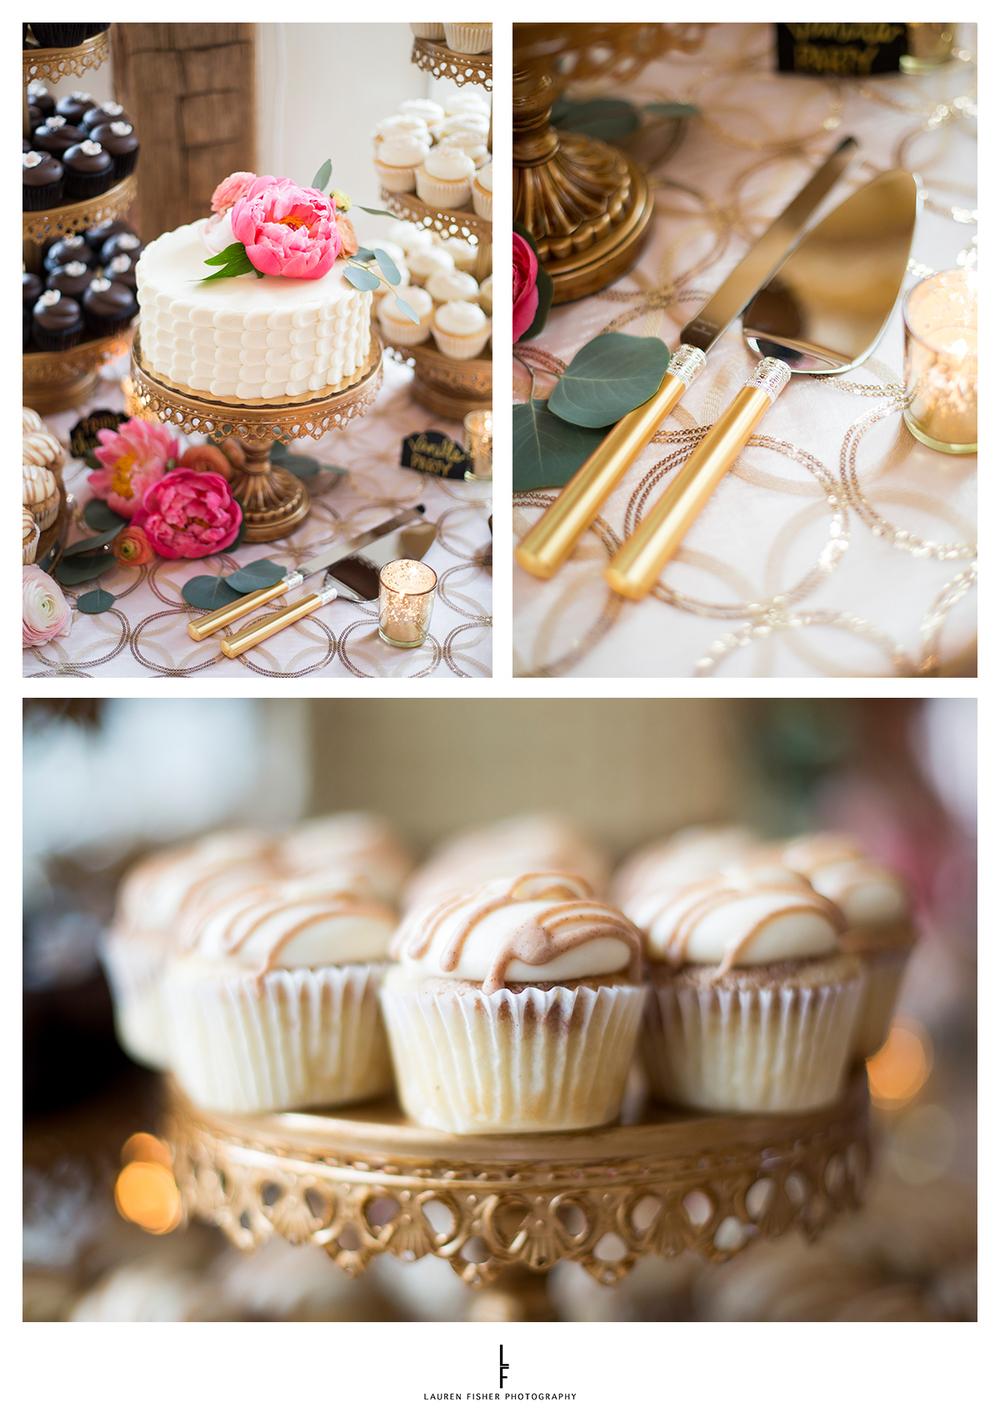 Blog Collage-1462898359866.jpg